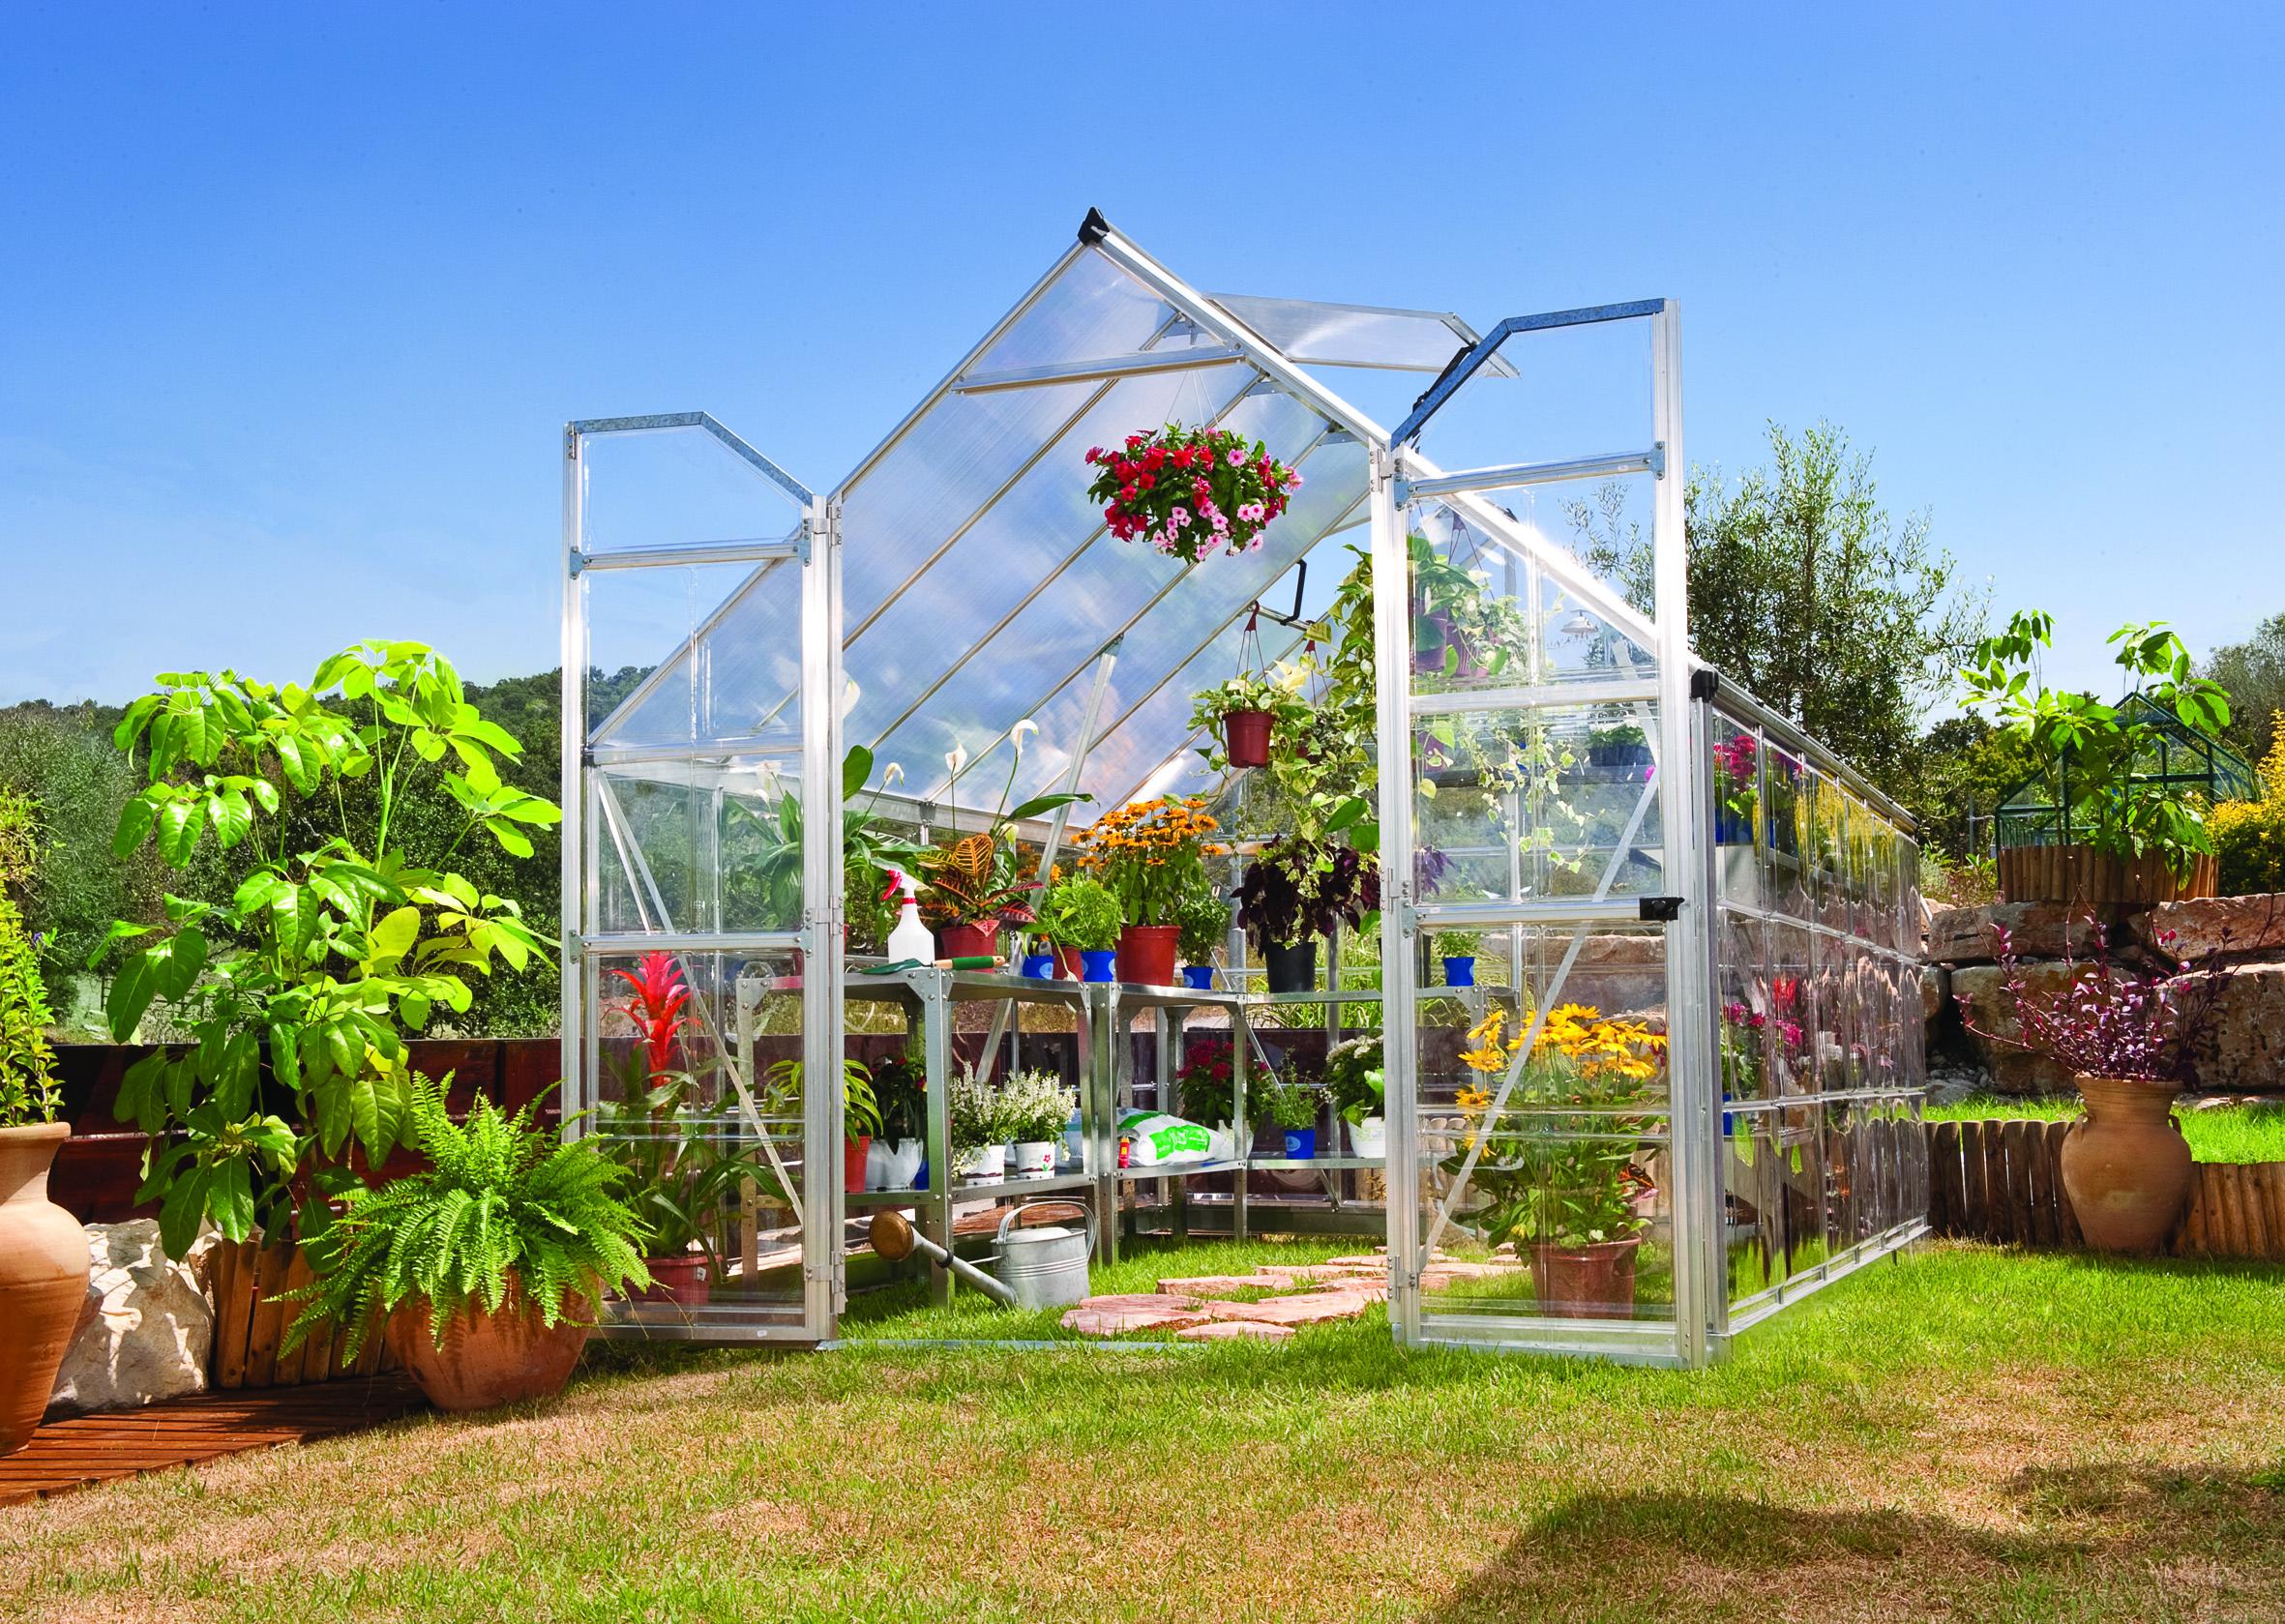 polykarbonátový skleník Palram Balance 8x12 silver + ZDARMA základna skleníku + ZDARMA automatický otvírač oken + ZDARMA sada 10ti háčků pro rostliny + hnojivo Biocin + prodloužená ZÁRUKA 10 LET